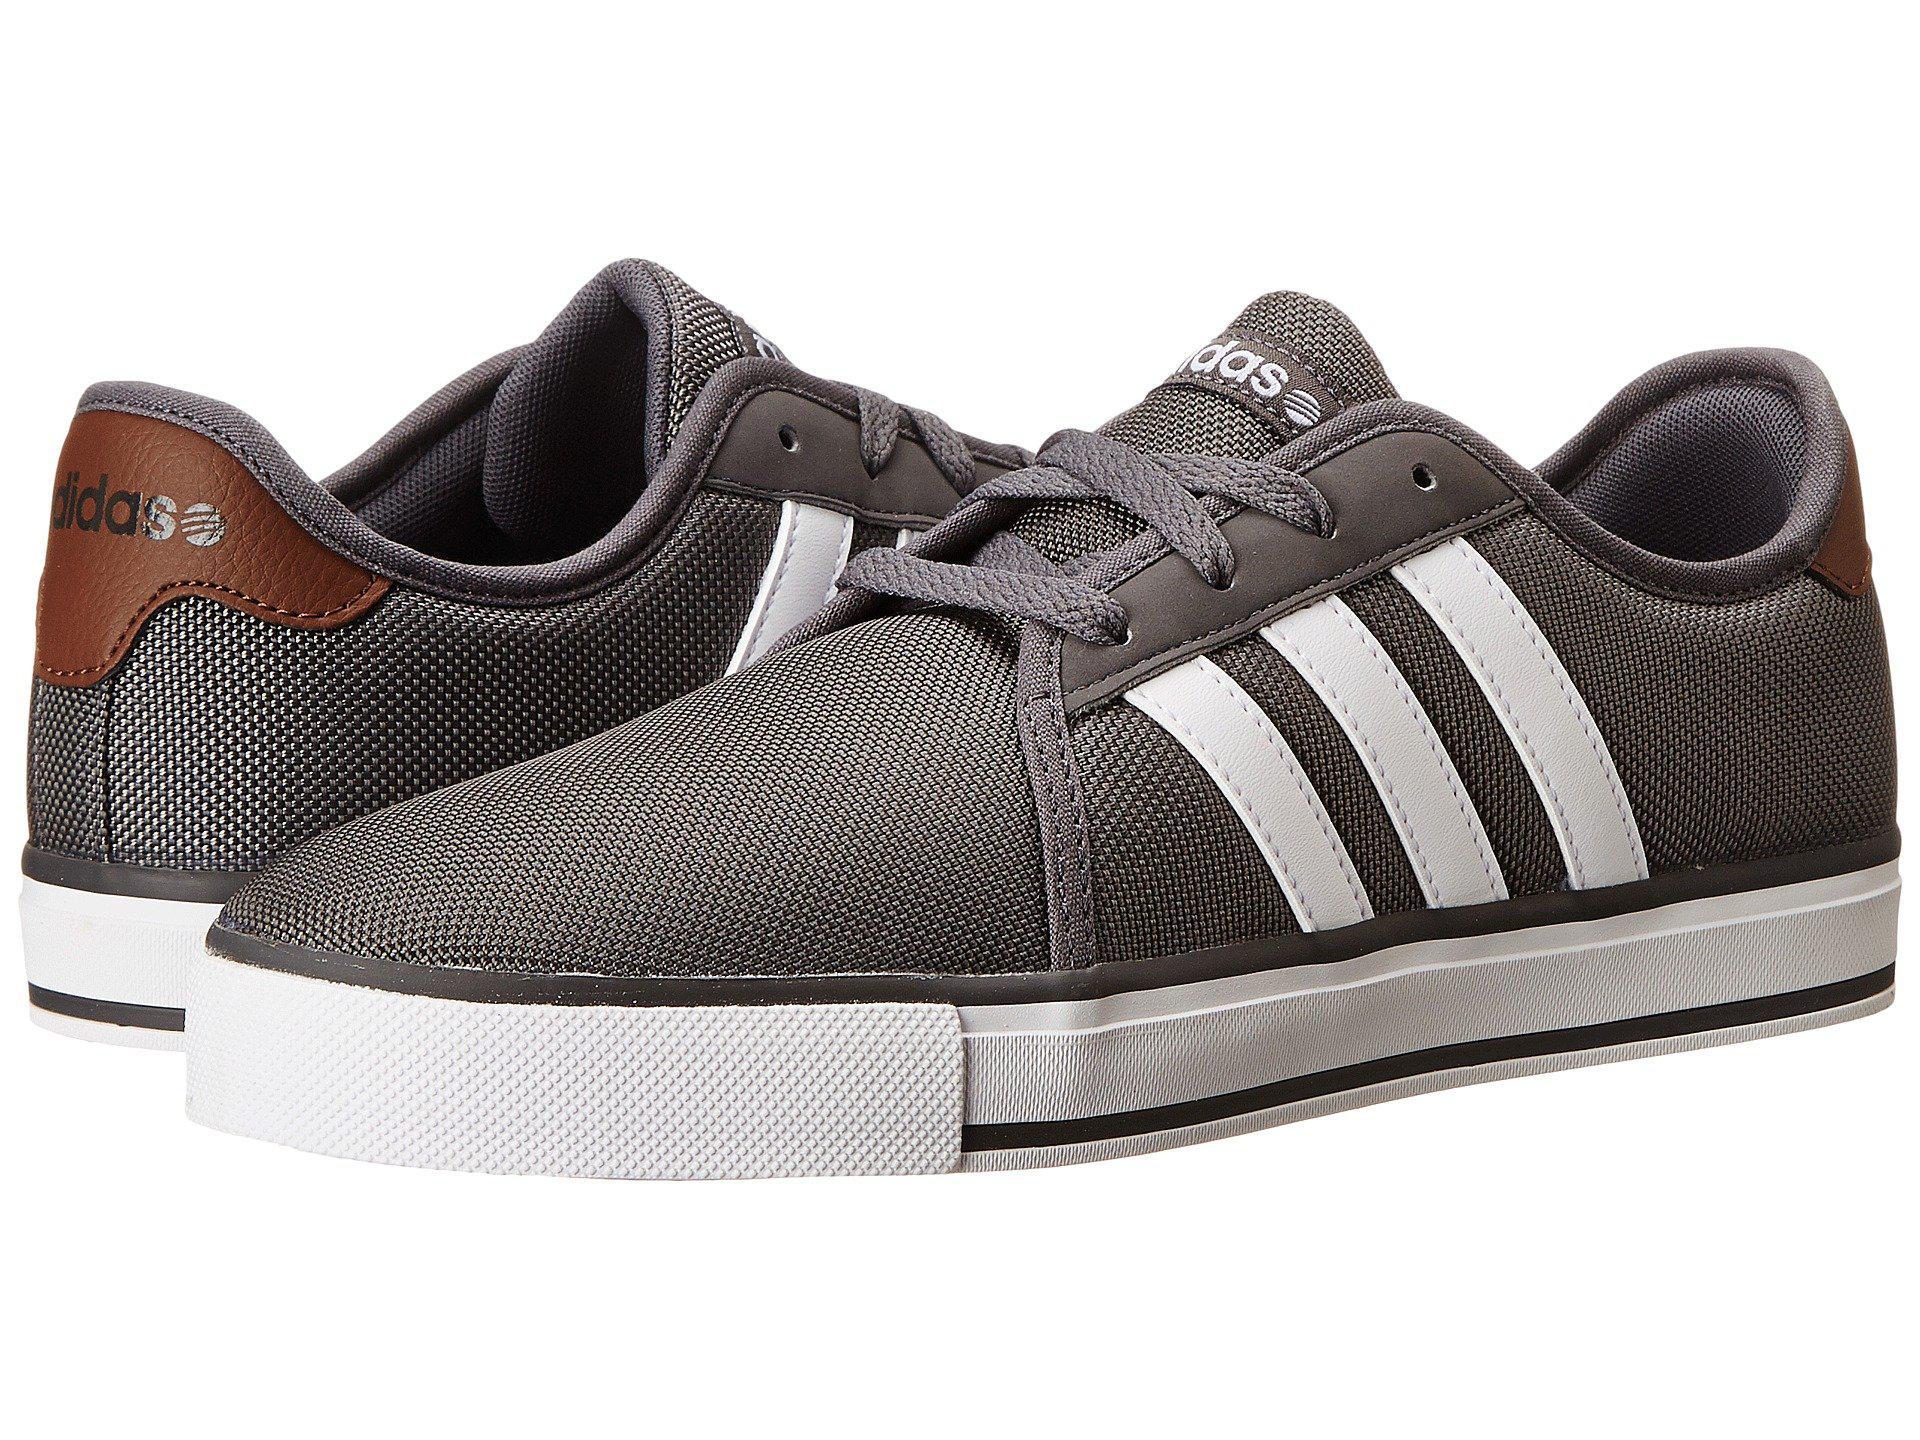 Adidas Sneakers Mens - Adidas Sk Lvs Grey White